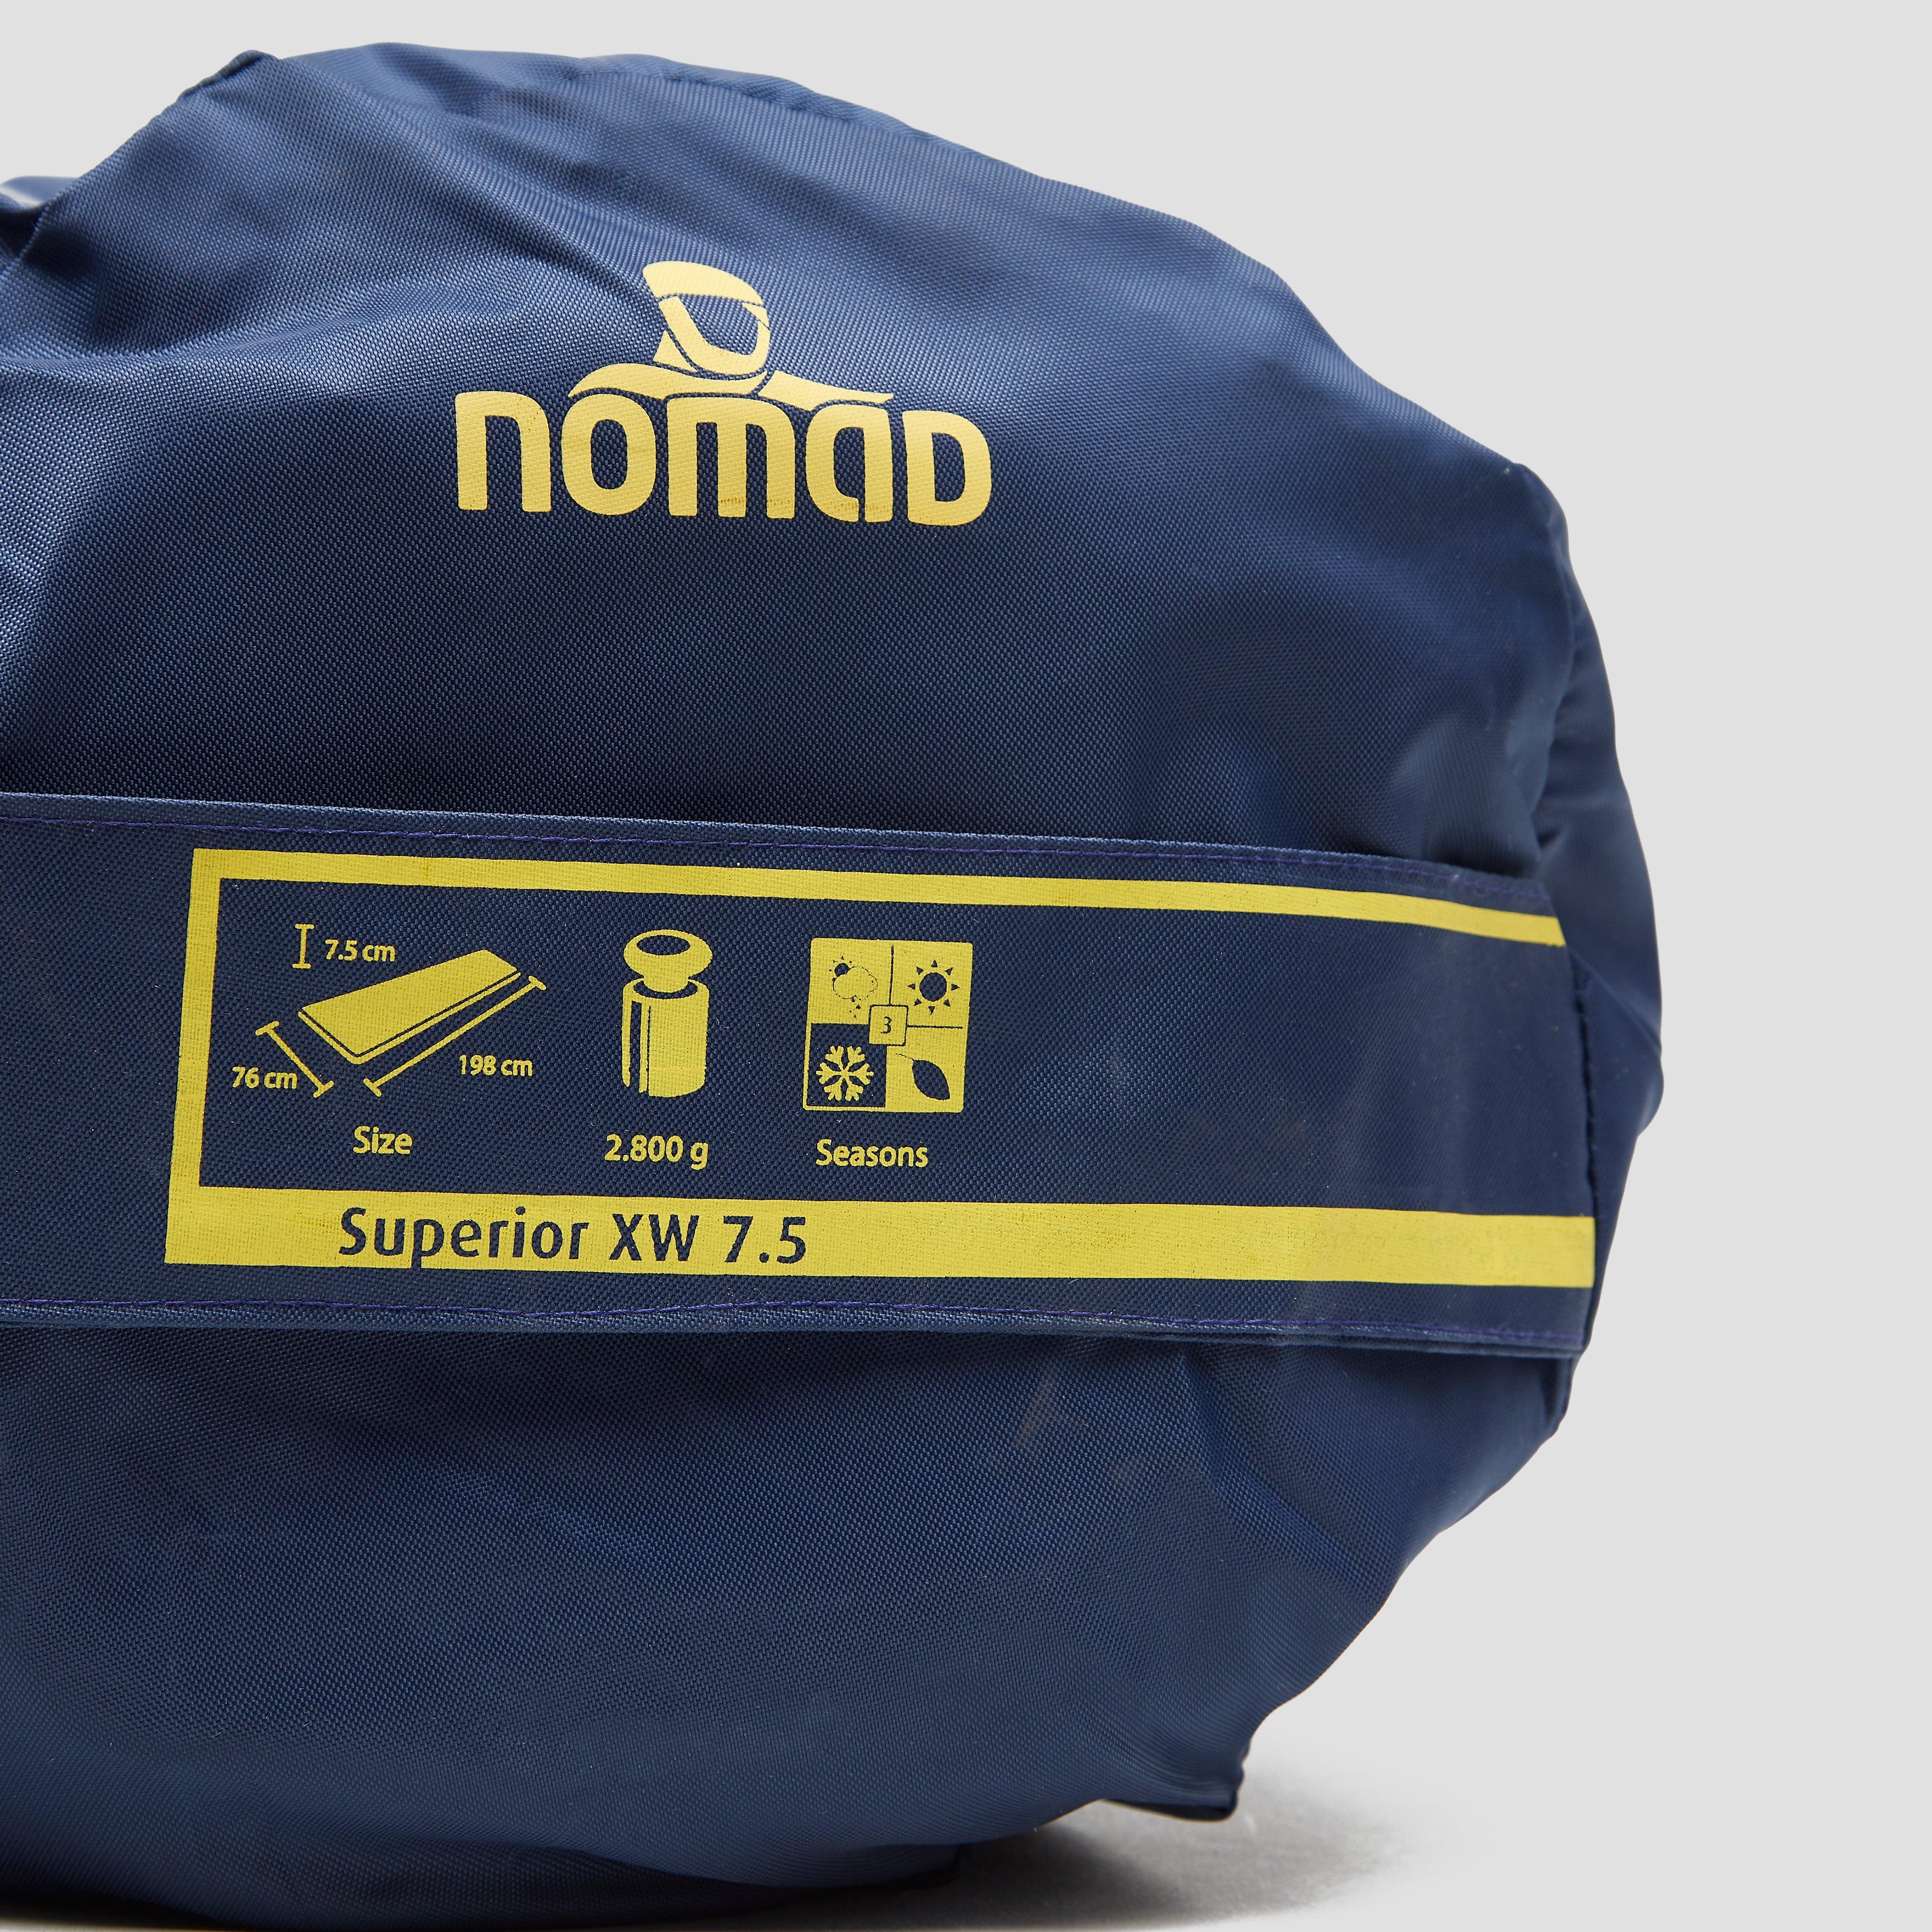 NOMAD SUPERIOR 7.5 XW SLAAPMAT ROOD